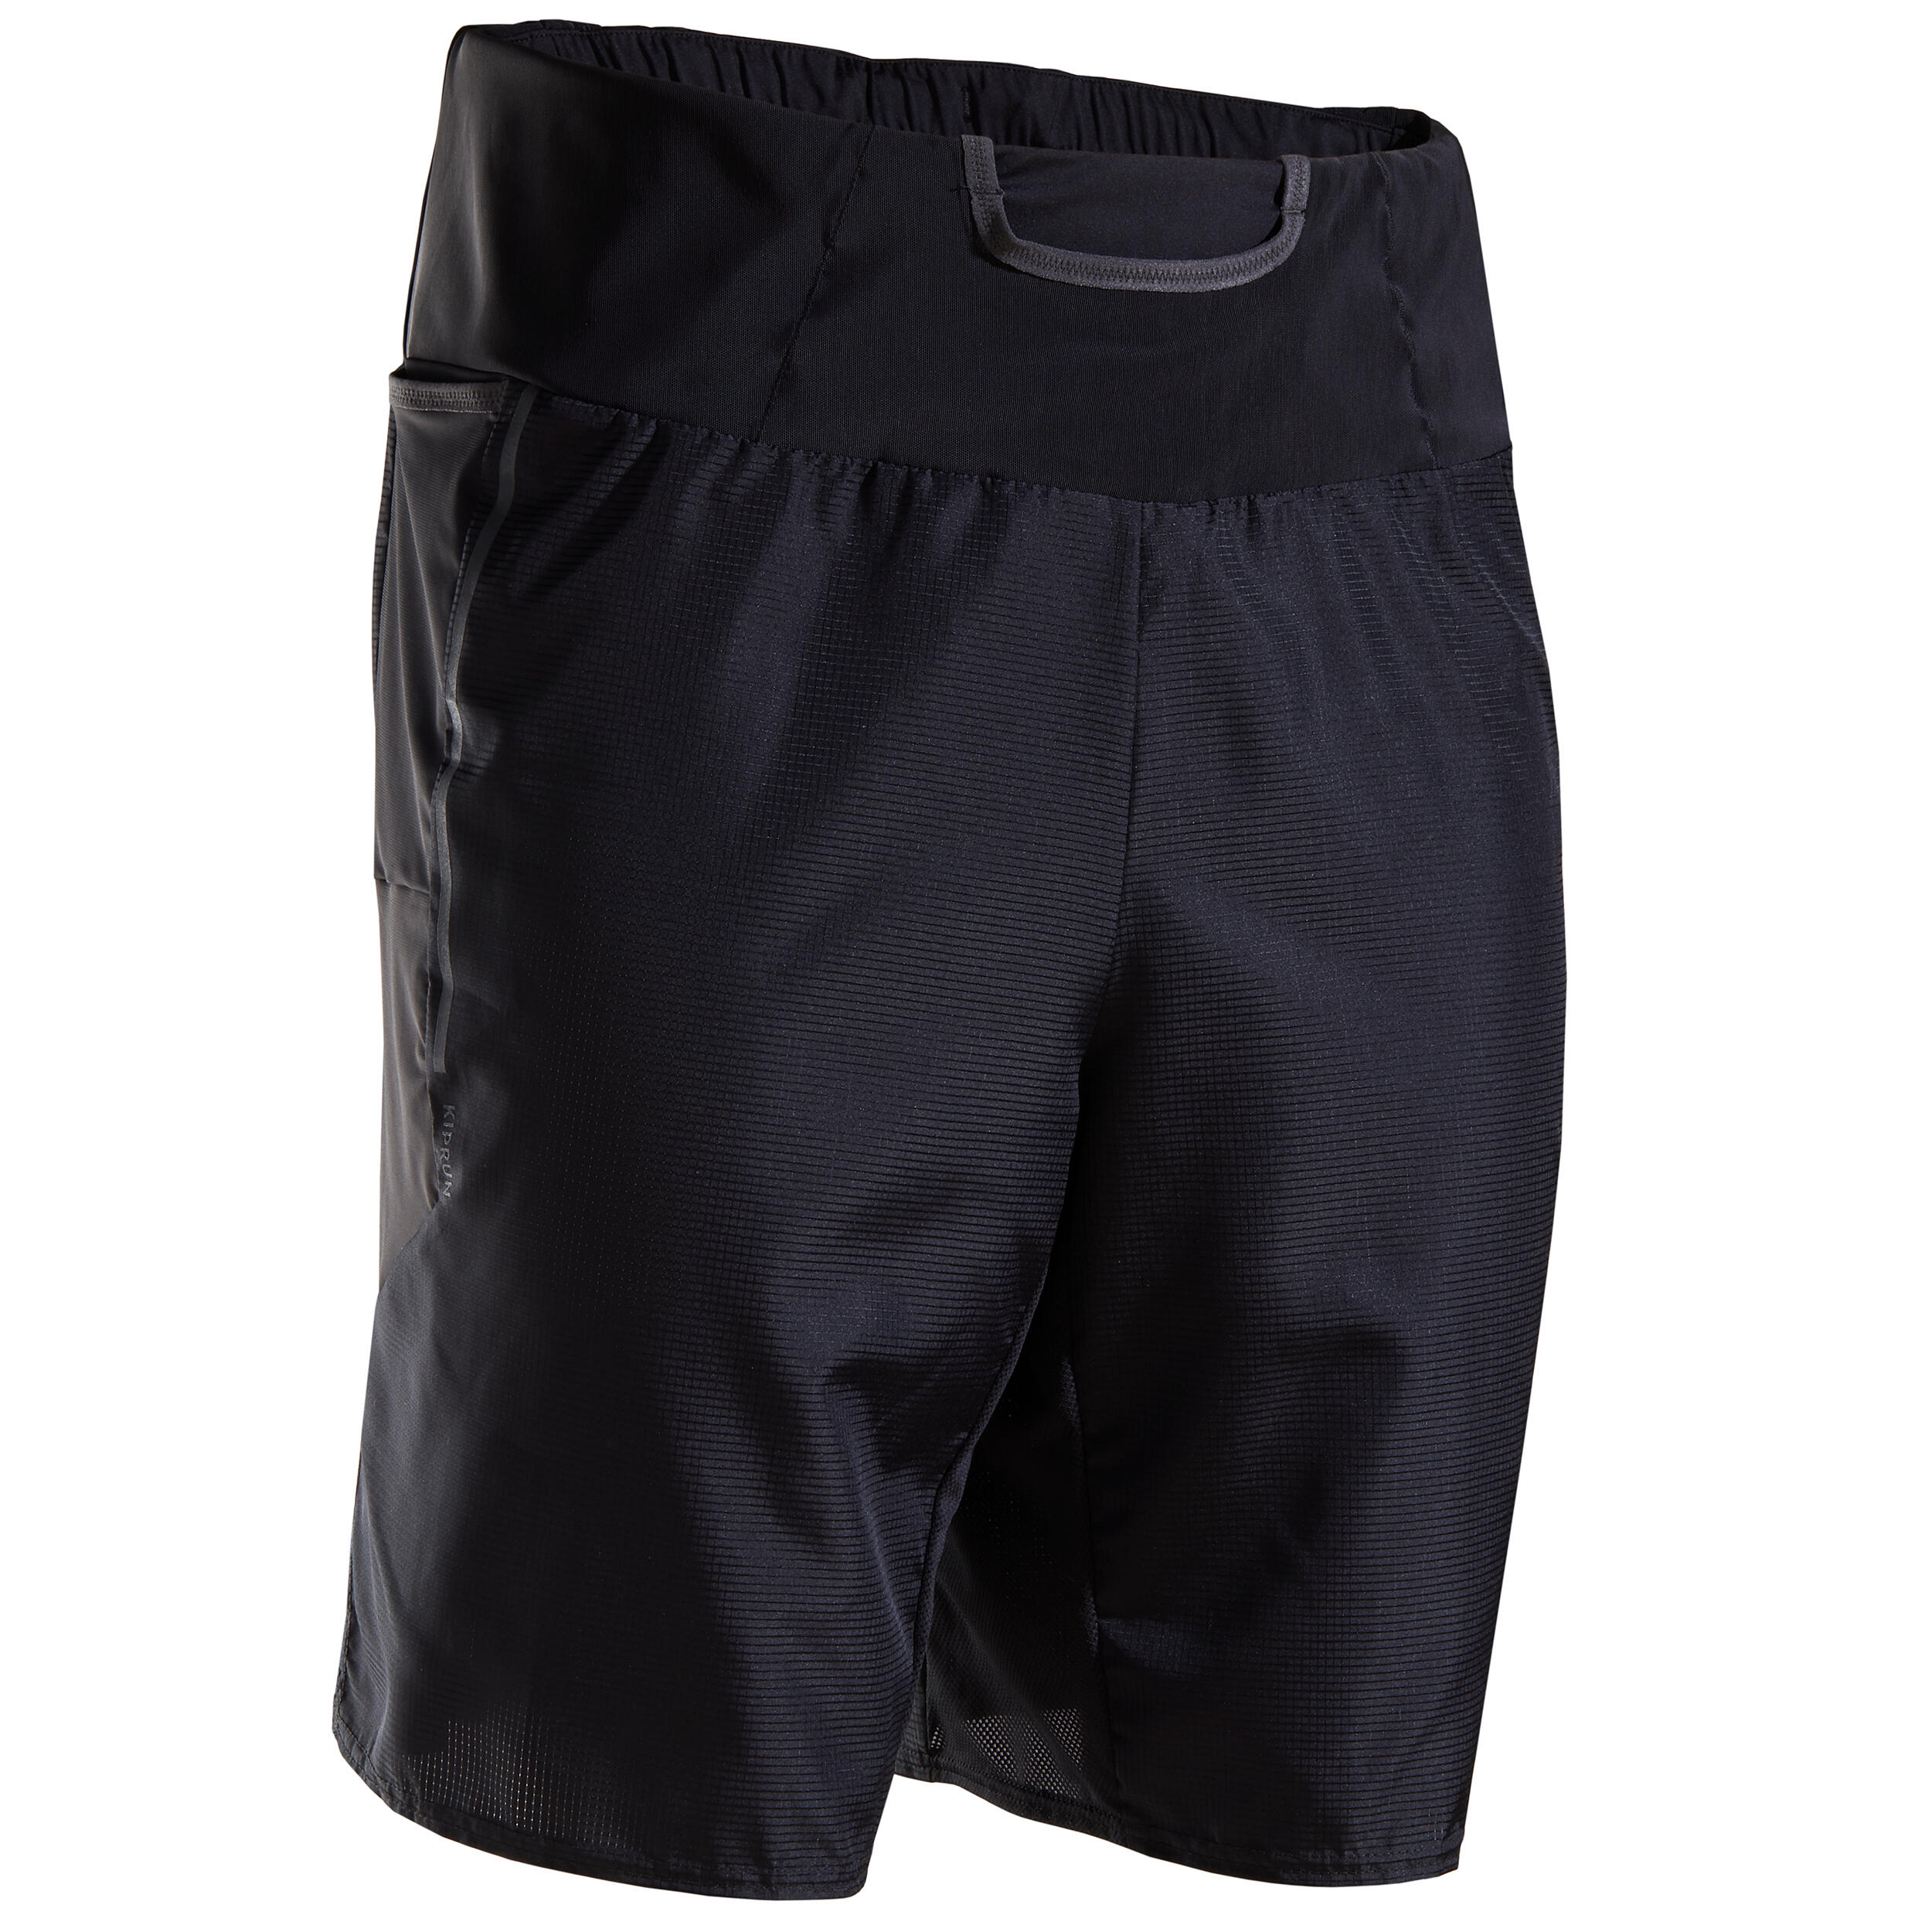 Laufshorts Marathon Herren schwarz | Sportbekleidung > Sporthosen > Laufhosen | Kiprun